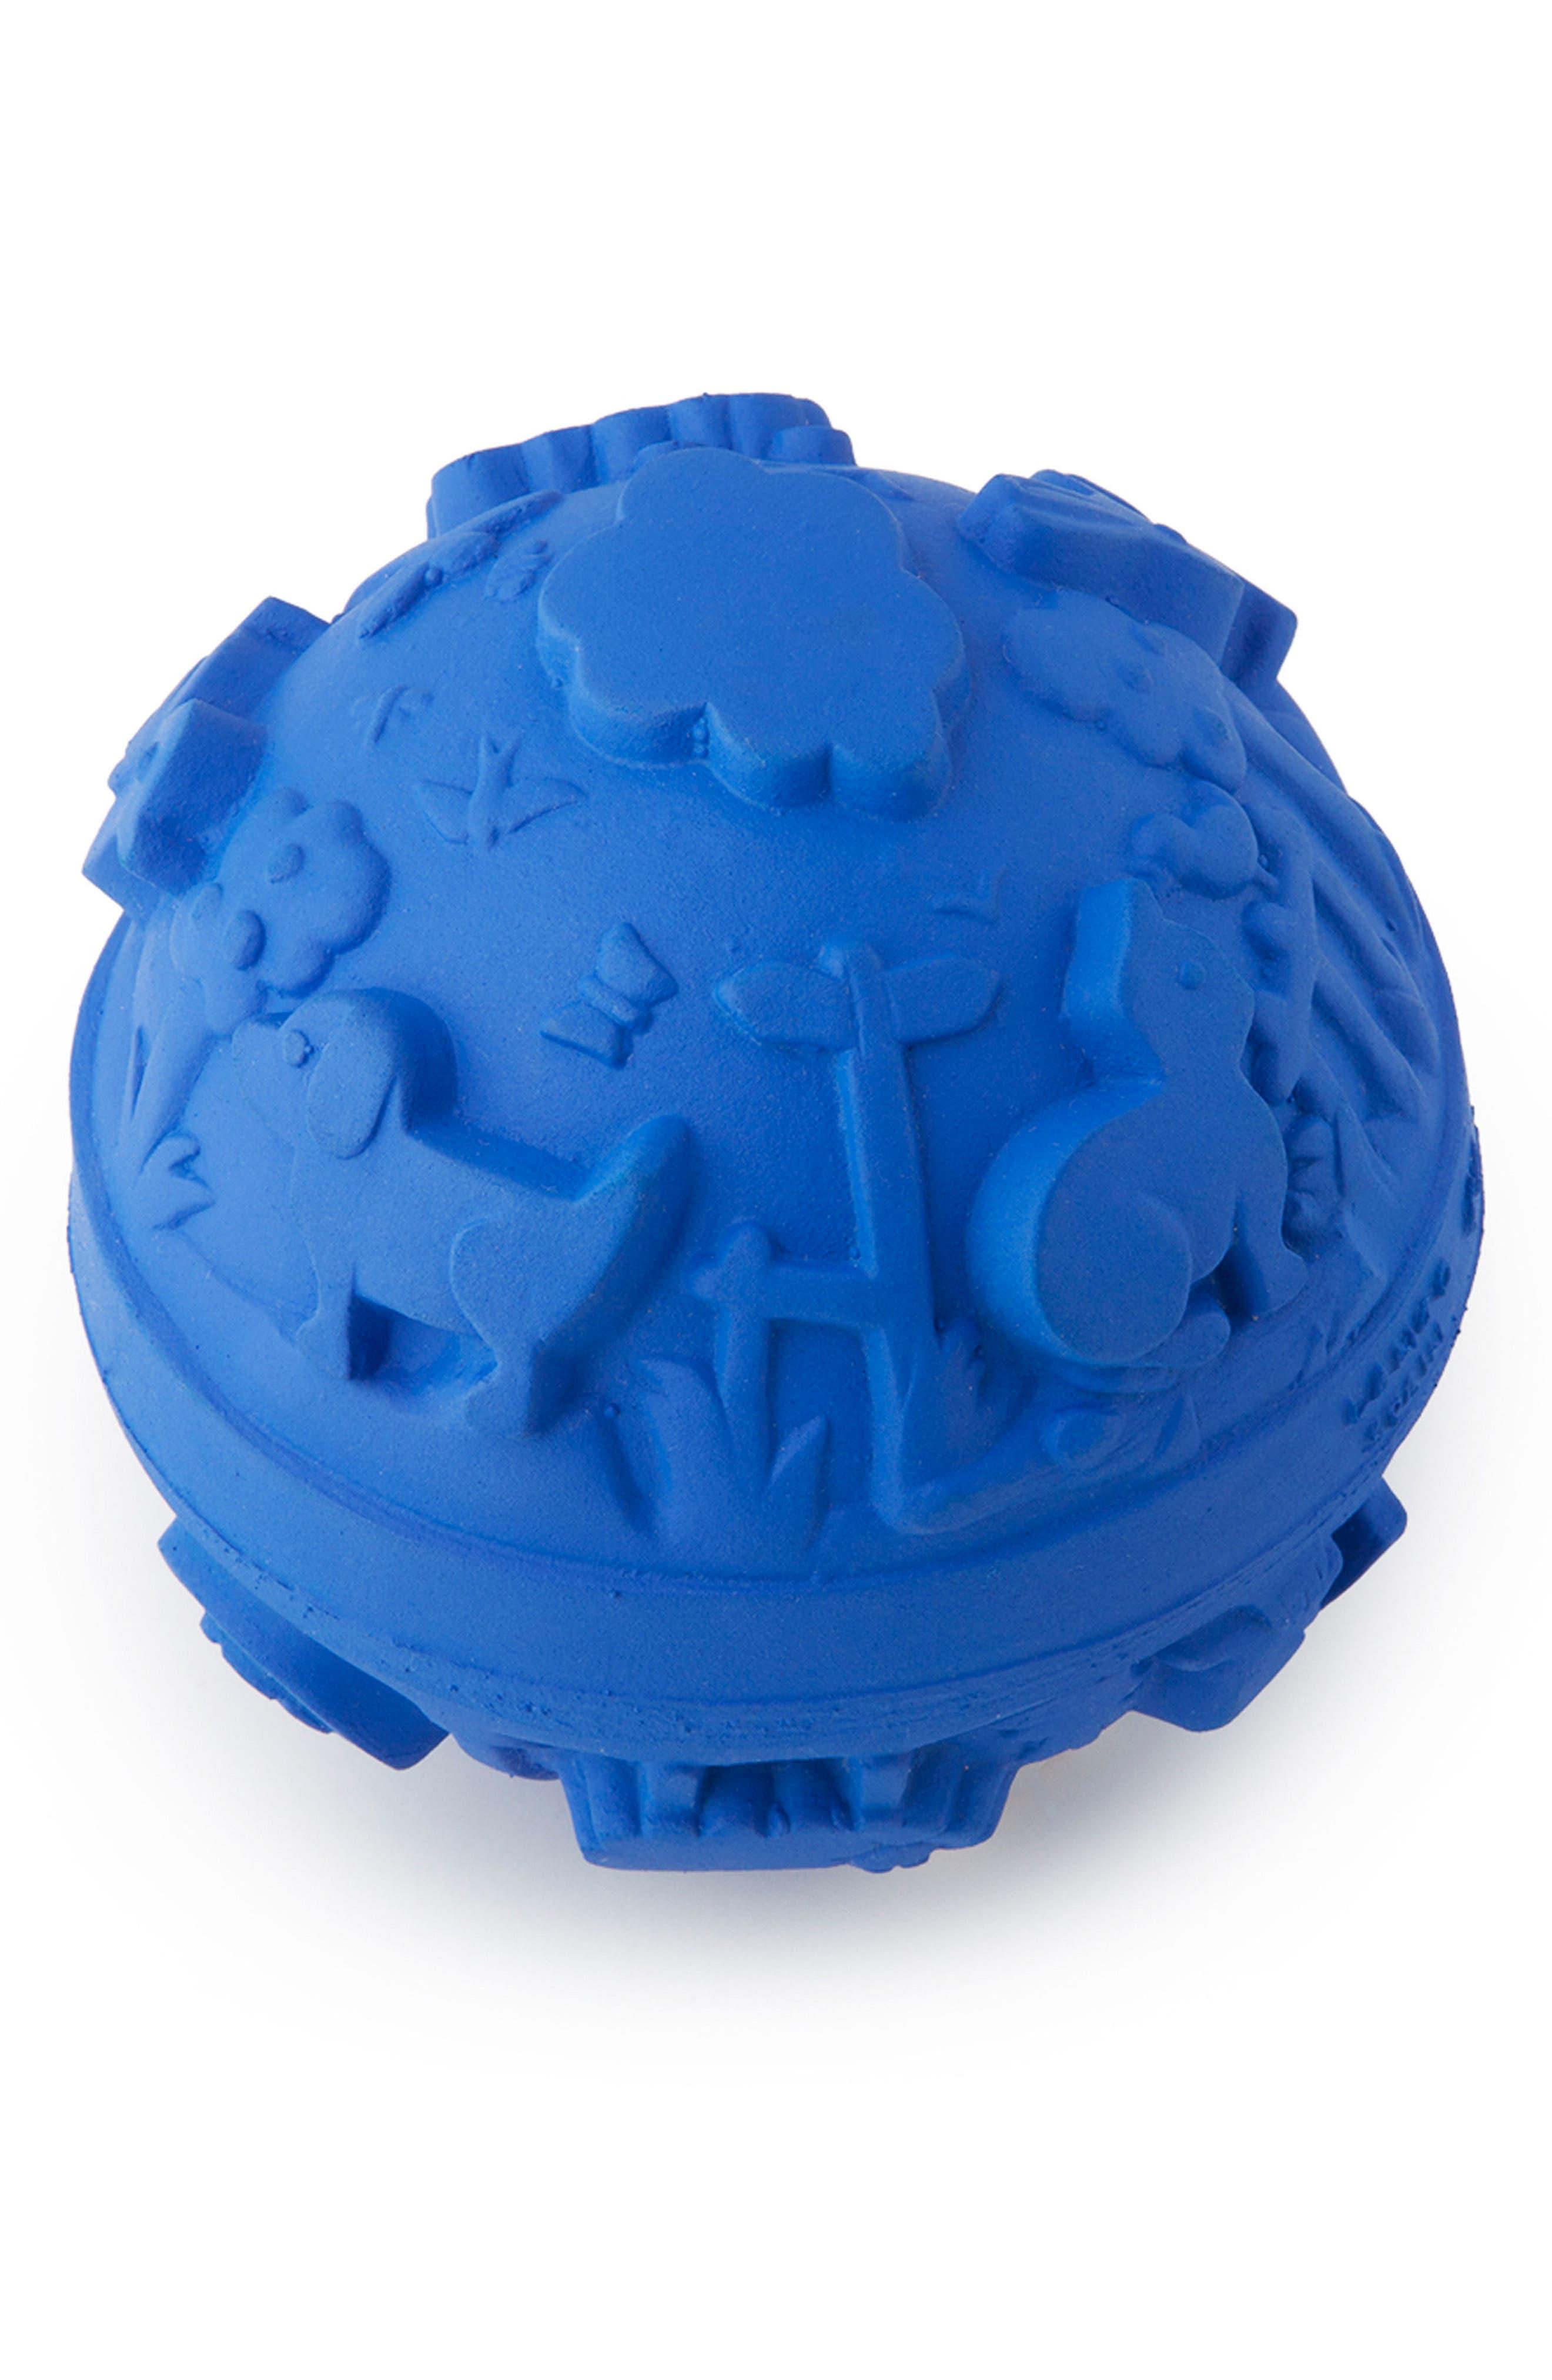 Main Image - Oli and Carol Baby Ball Teething Toy